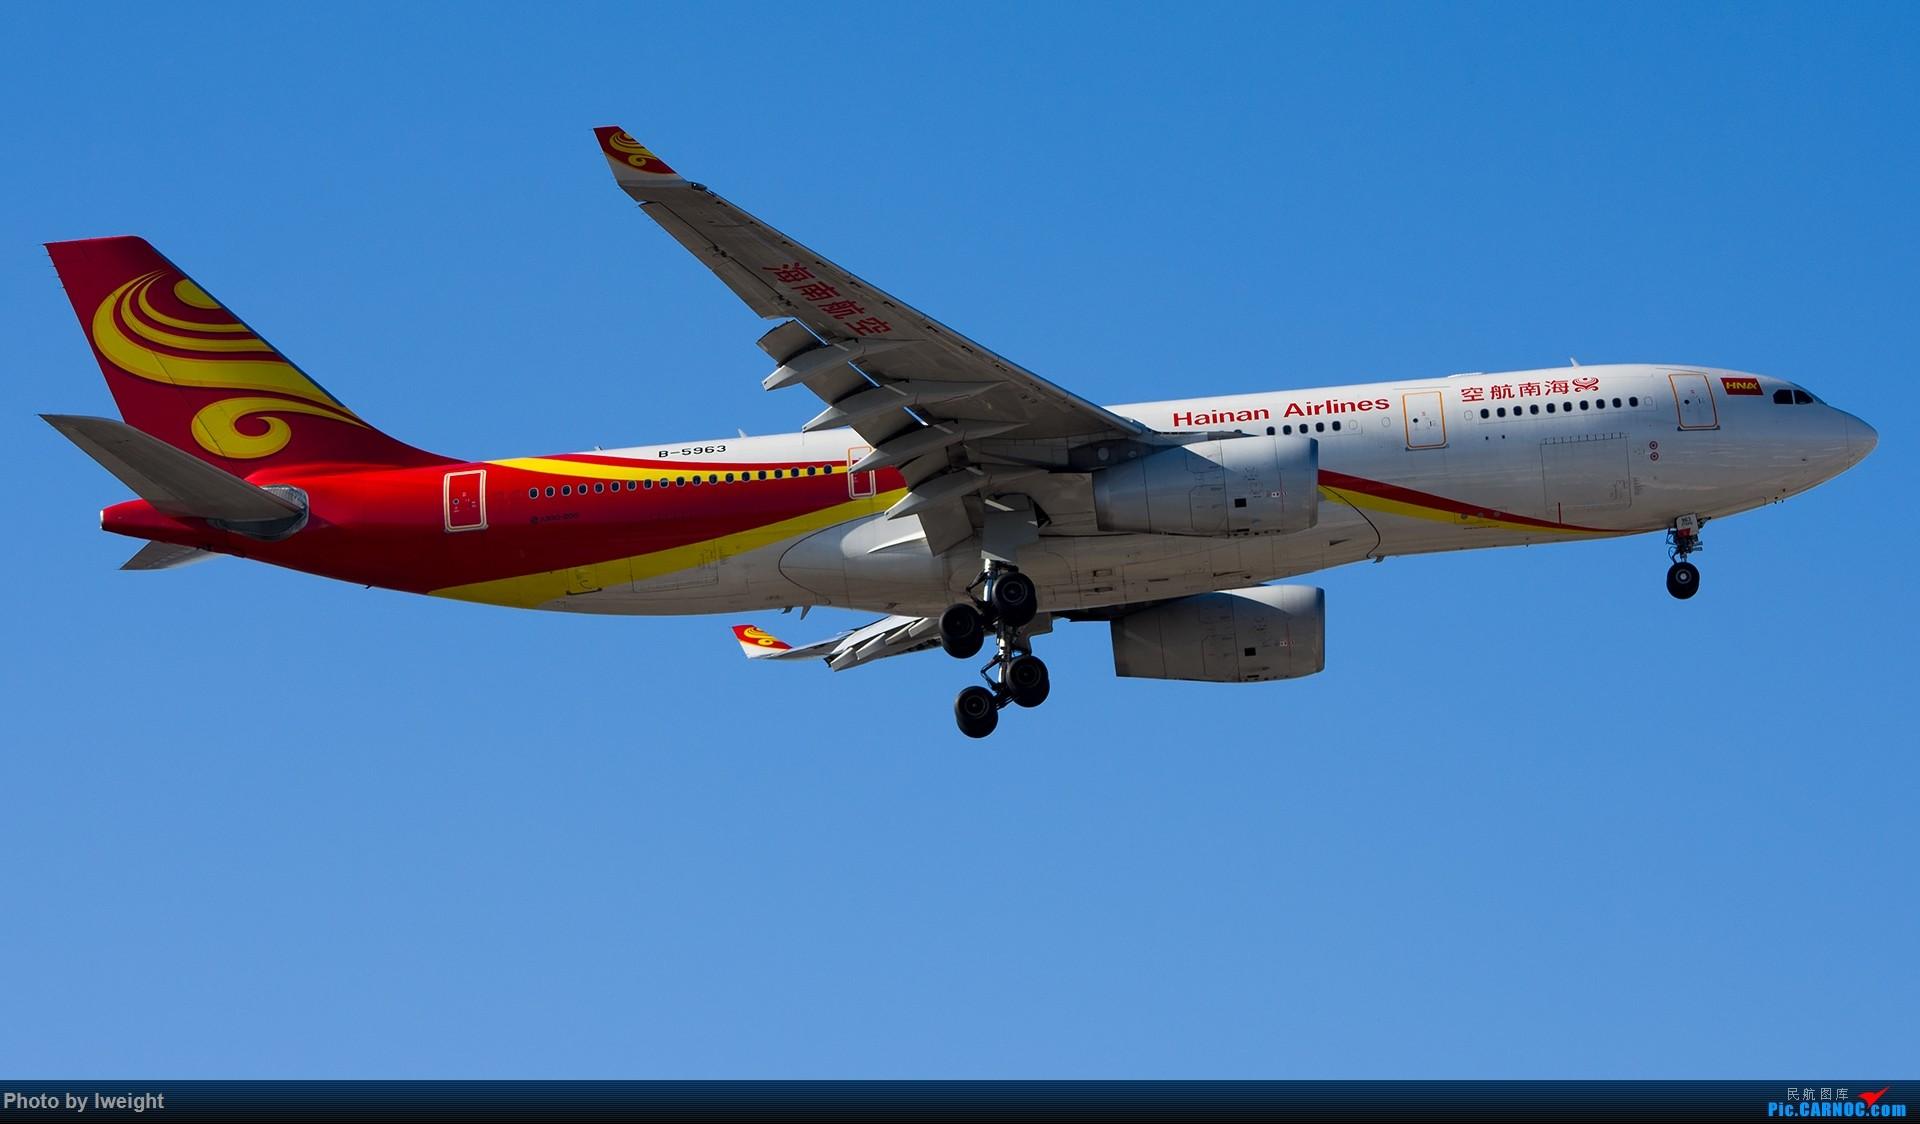 Re:[原创]终于在12月的北京等到了一个晴天的周末,出来拍拍飞机【2015-12-5】 AIRBUS A330-200 B-5963 中国北京首都国际机场